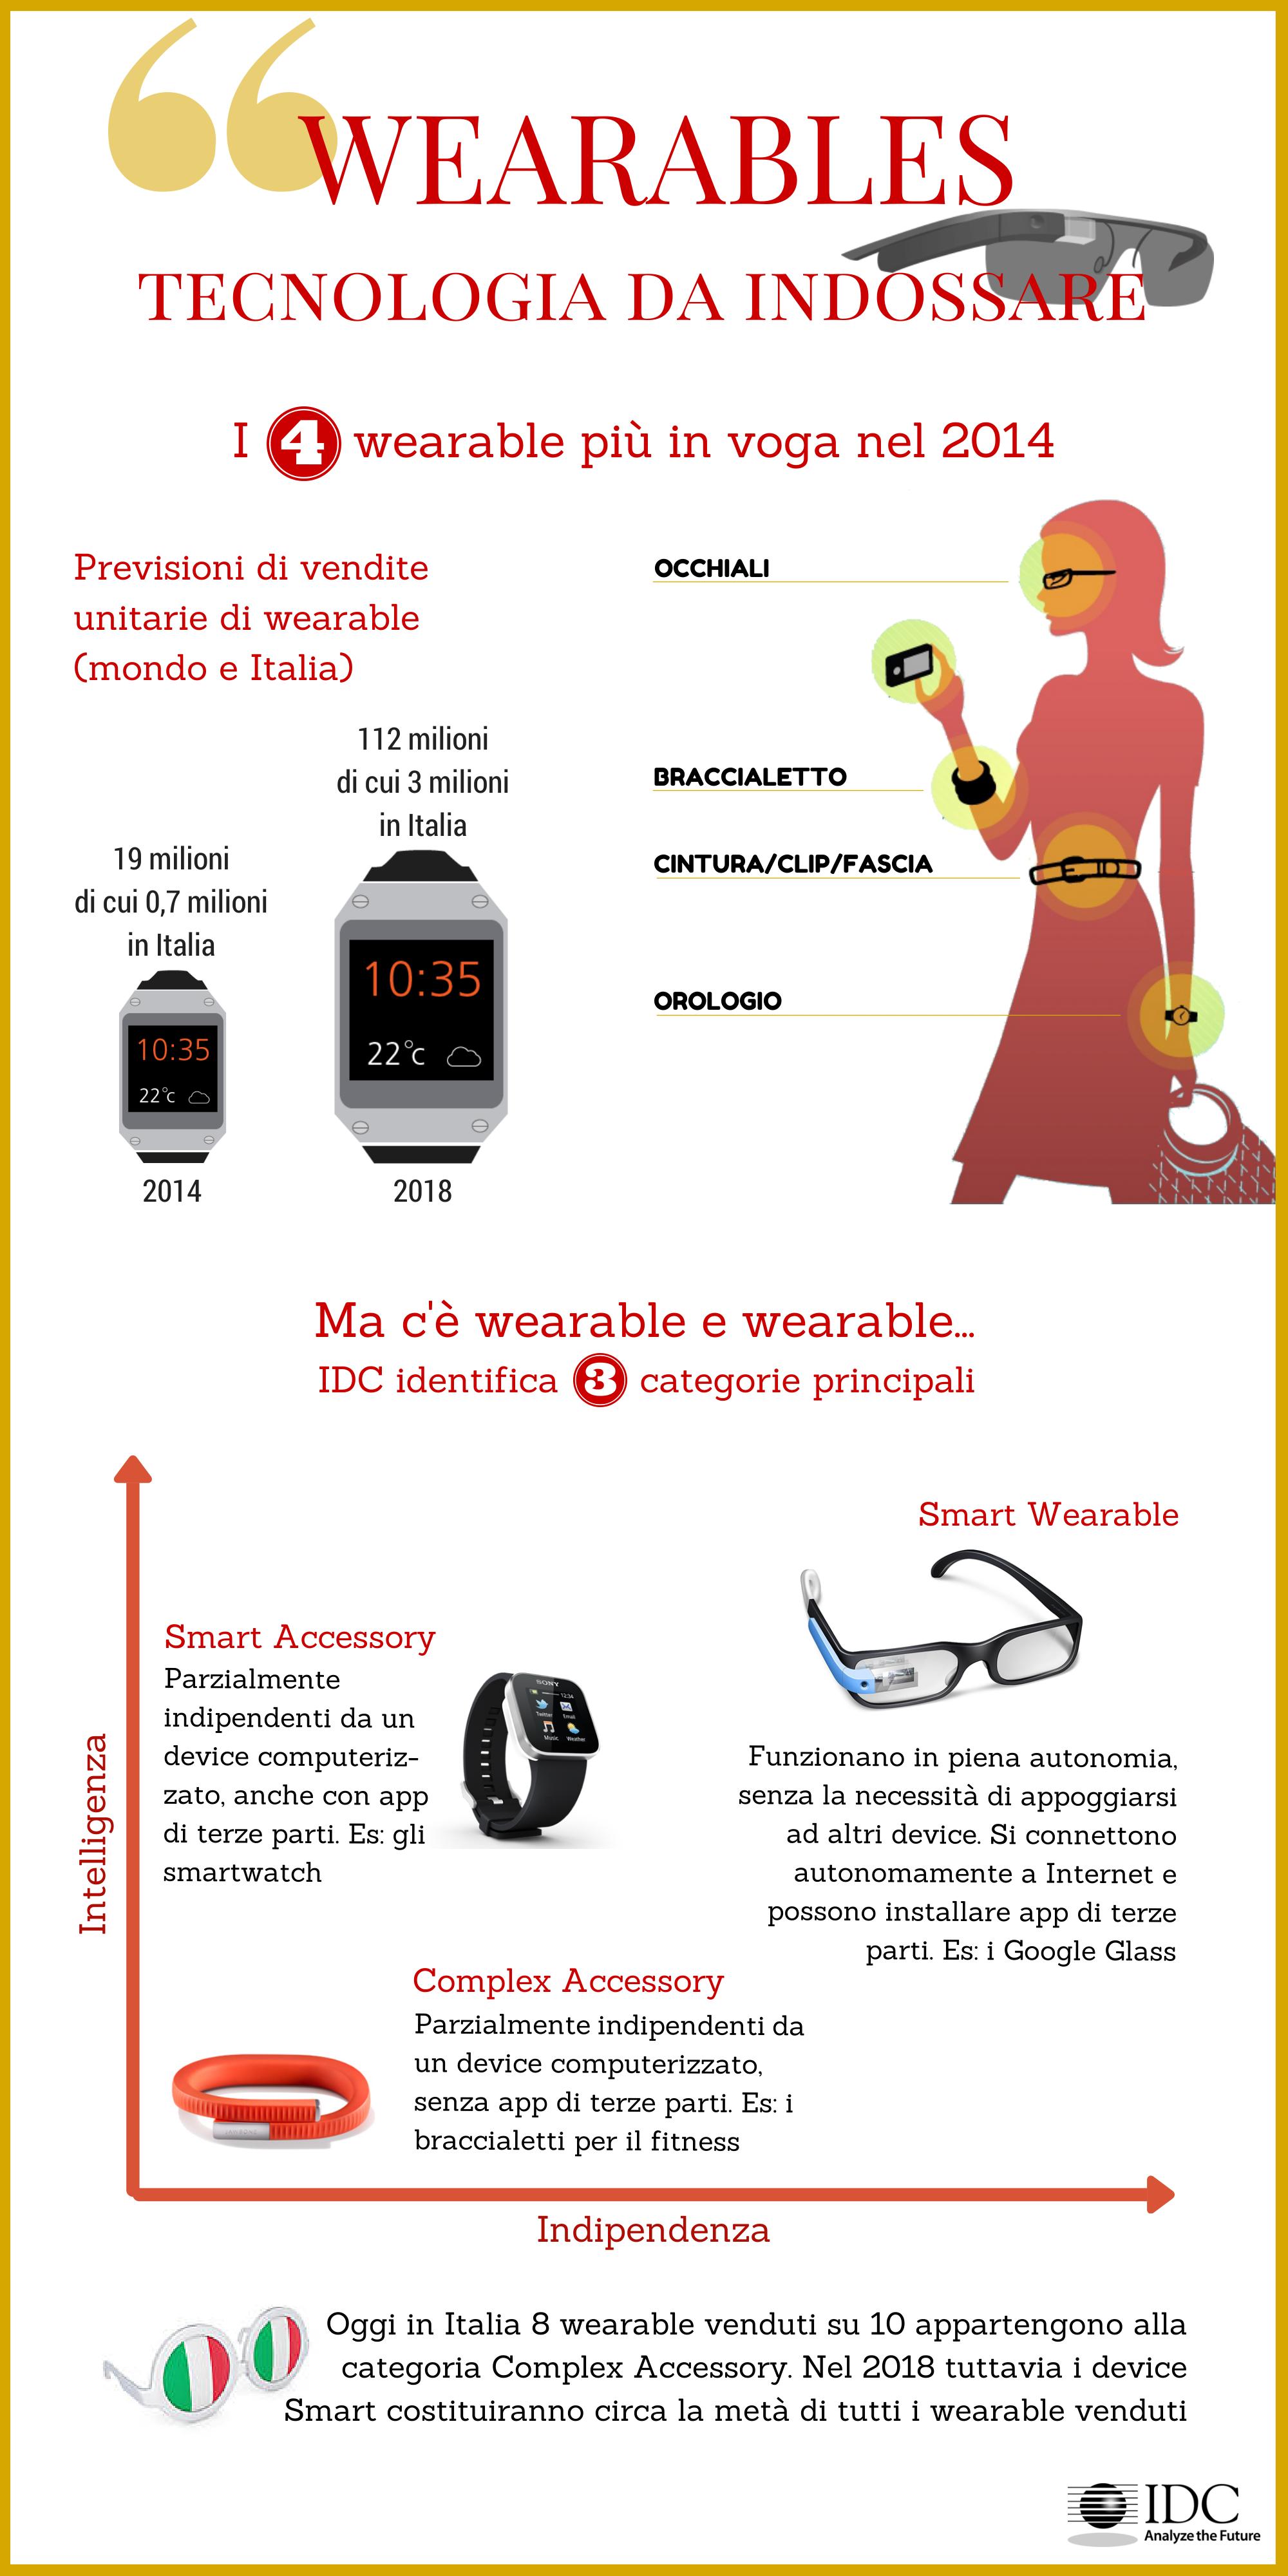 Wearable, tecnologia da indossare